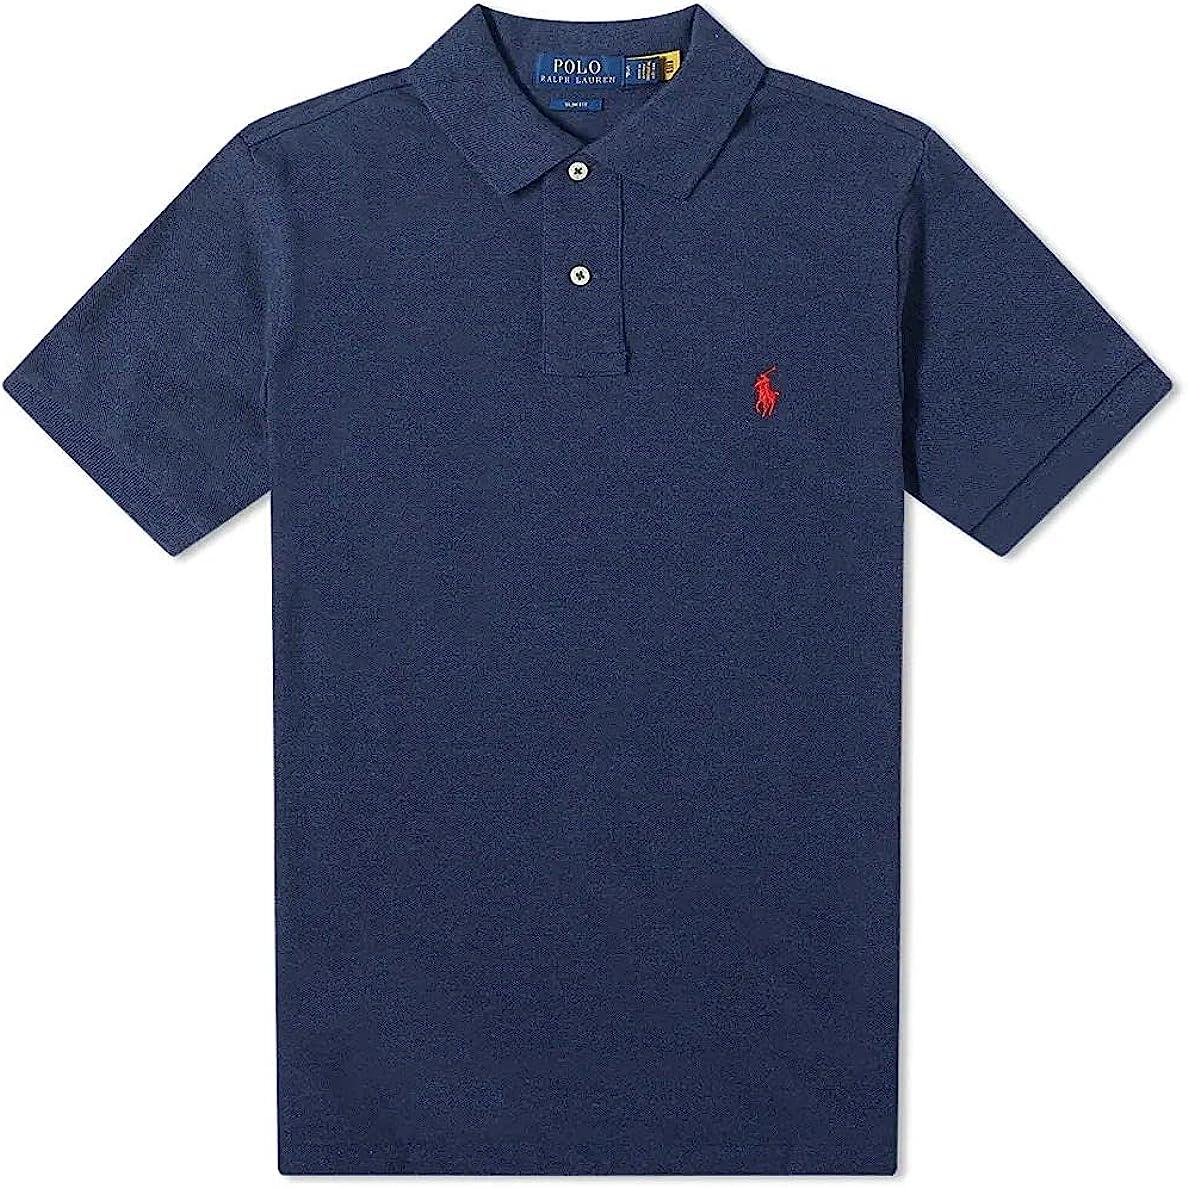 Polo by Ralph Lauren Mens Navy Slim Fit Mesh Polo Shirt